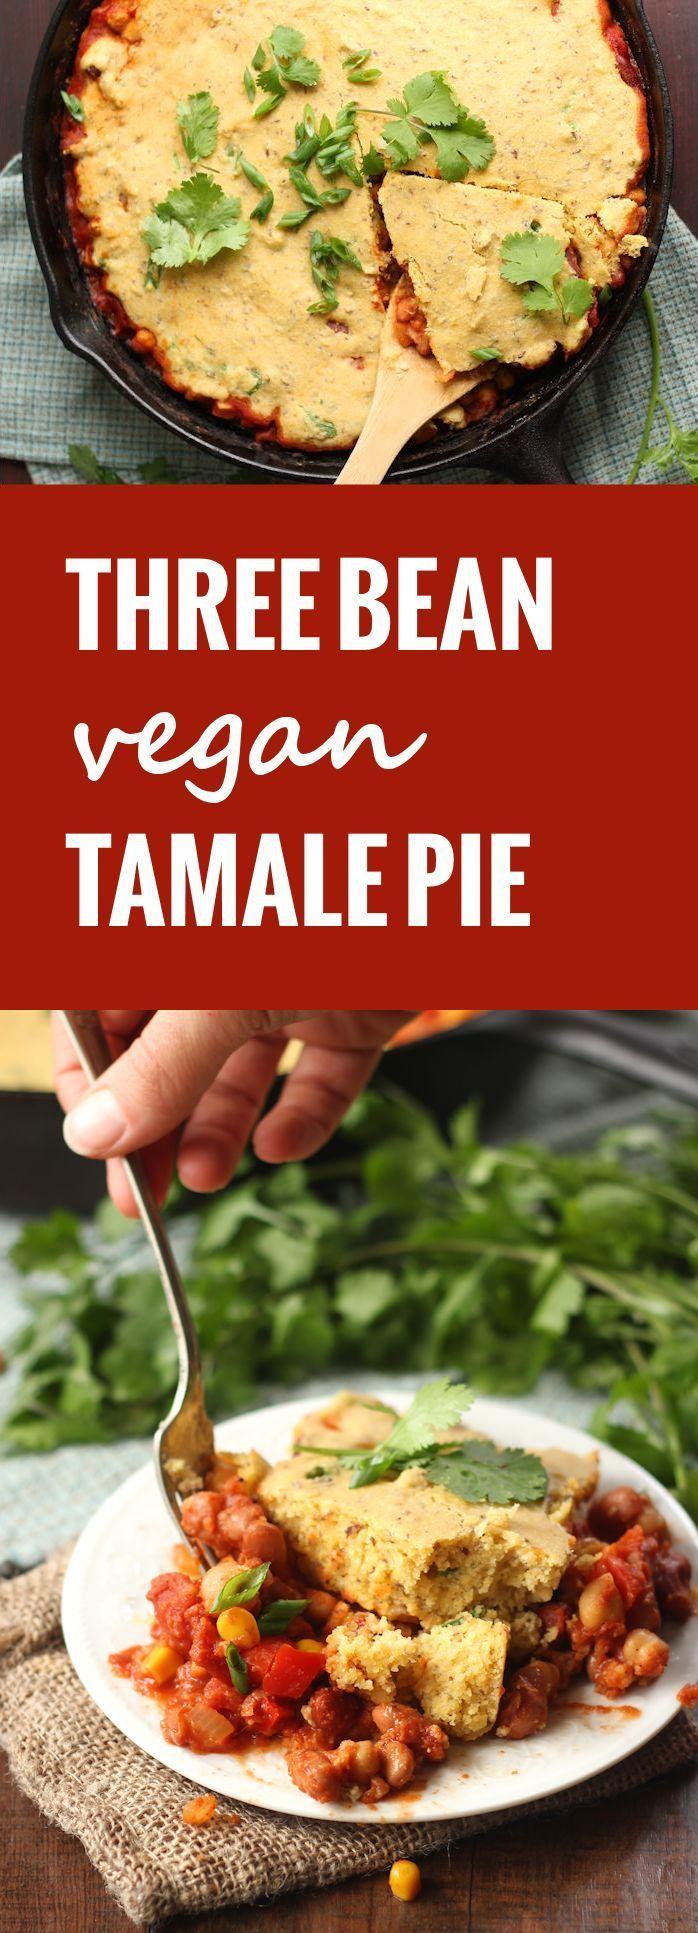 Three Bean Vegan Tamale Pie